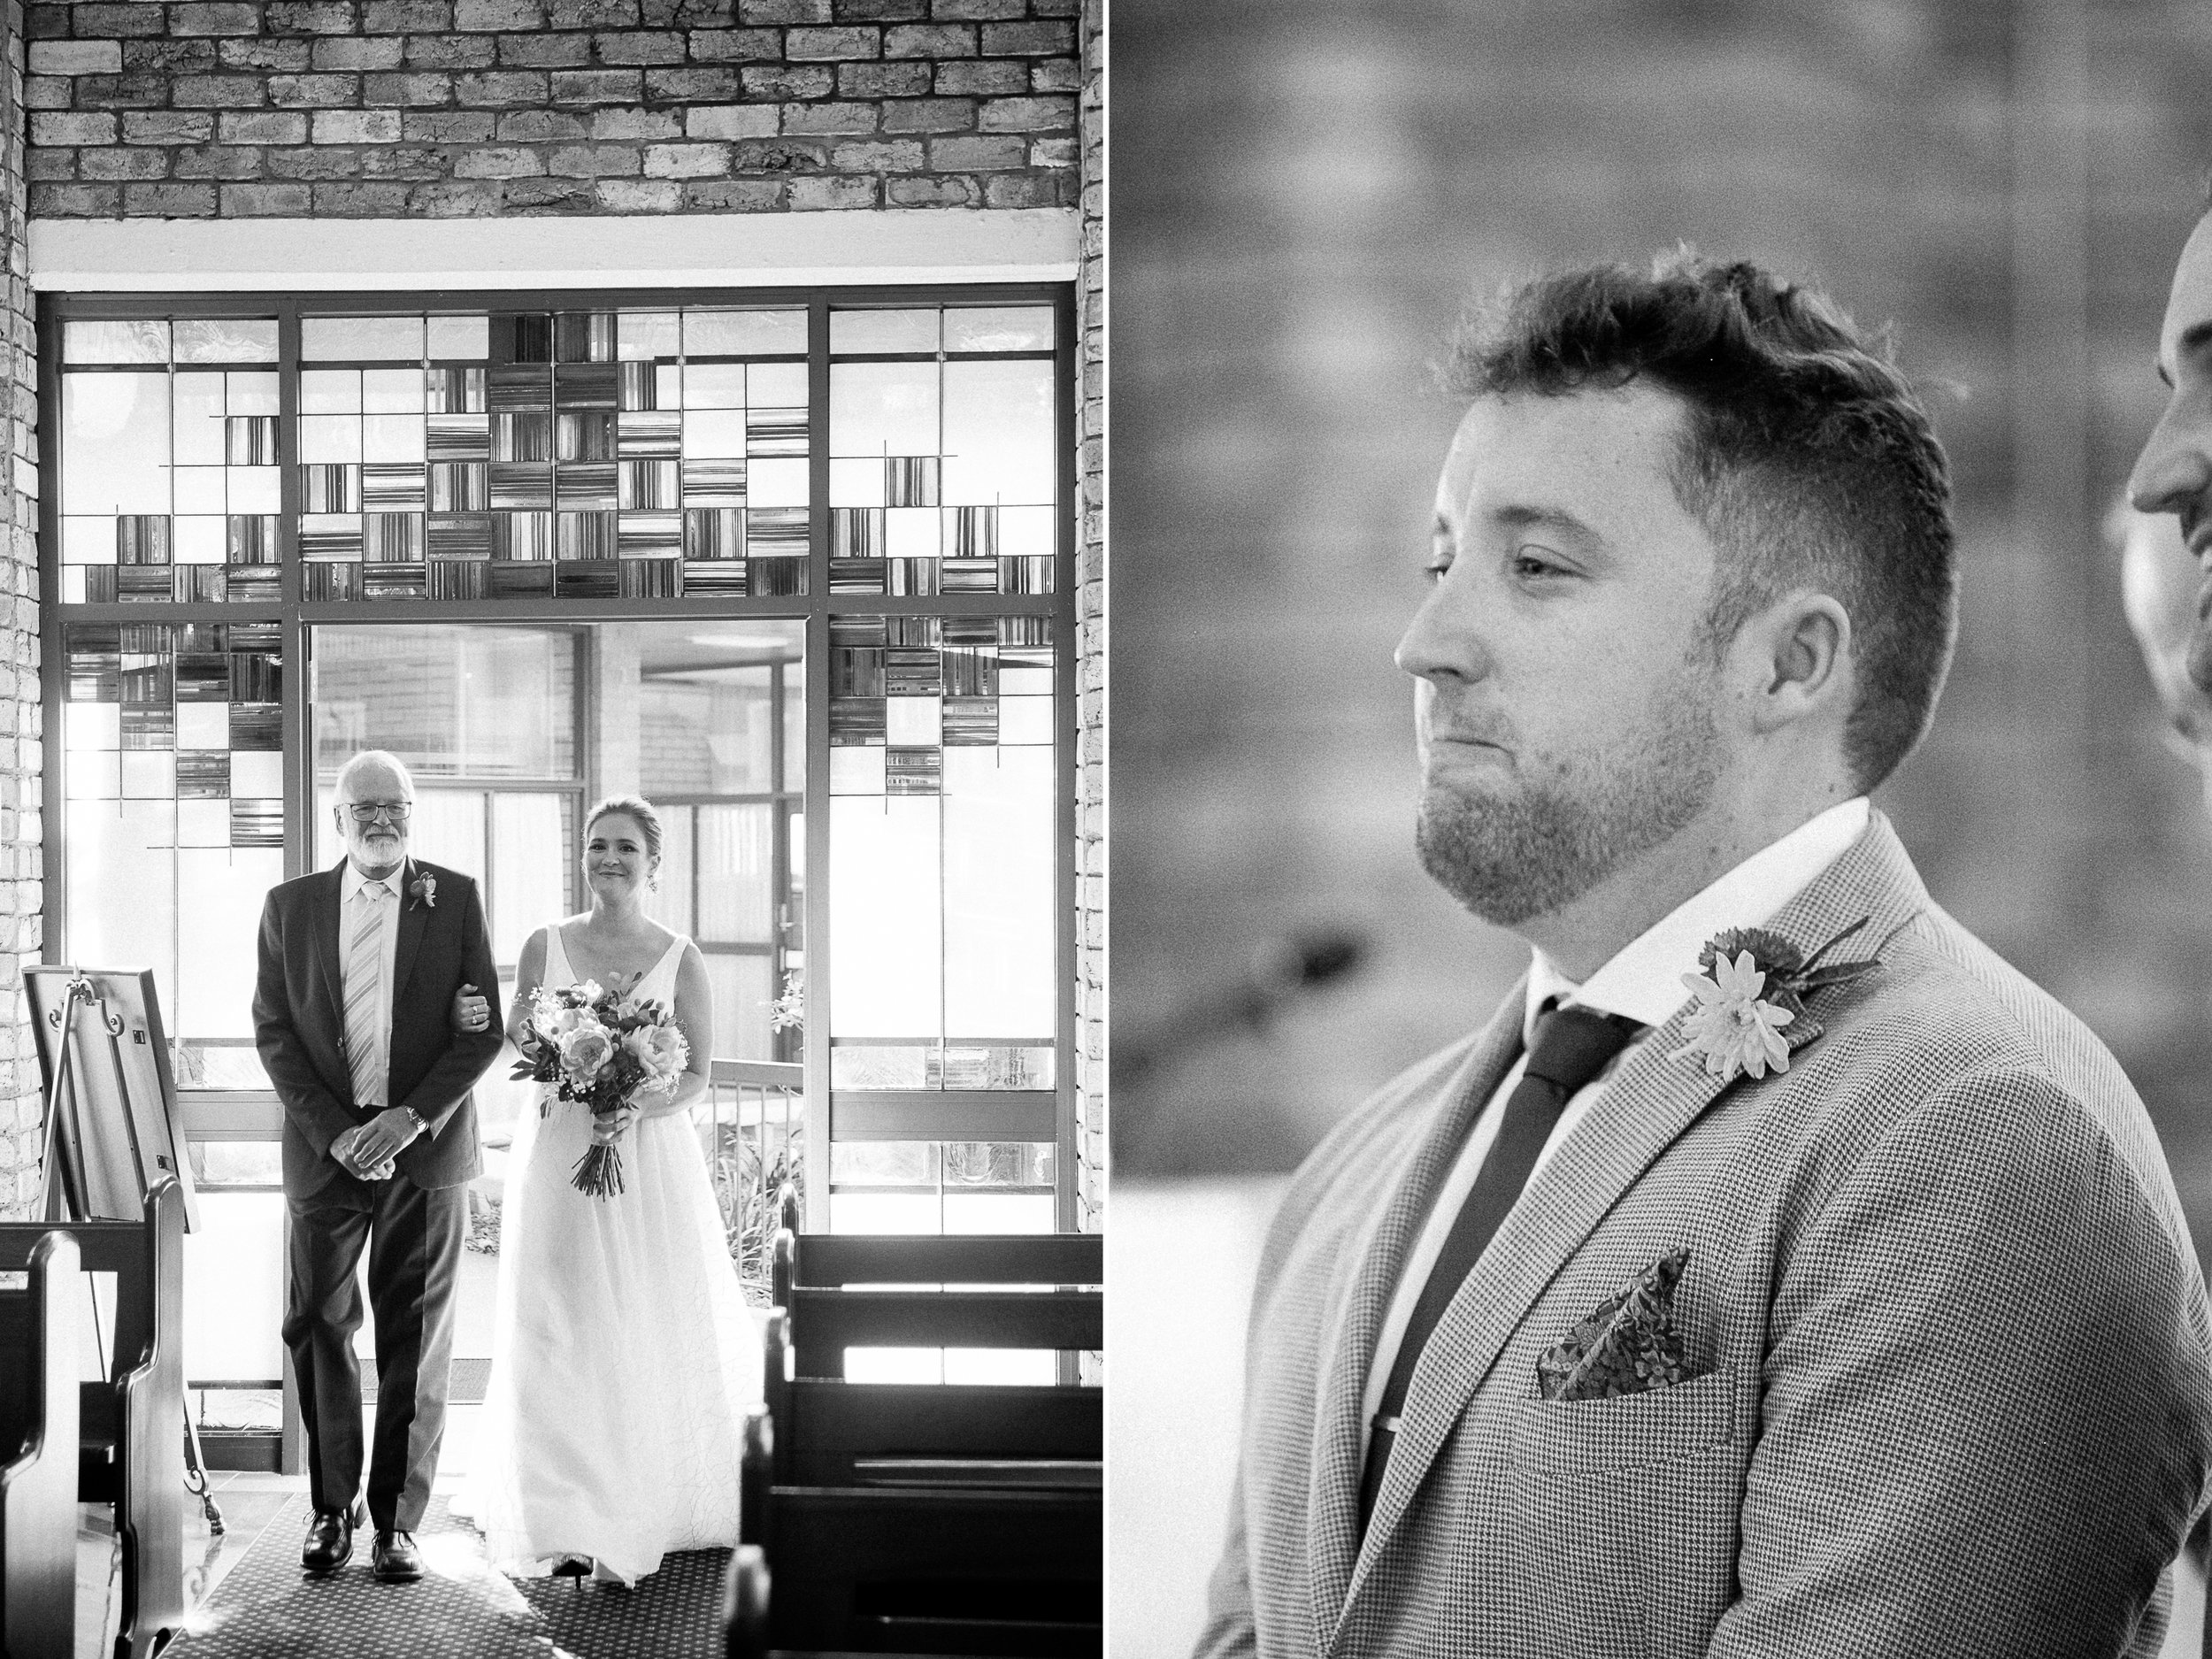 brisbane-city-refinery-wedding-photography-film-11.jpg